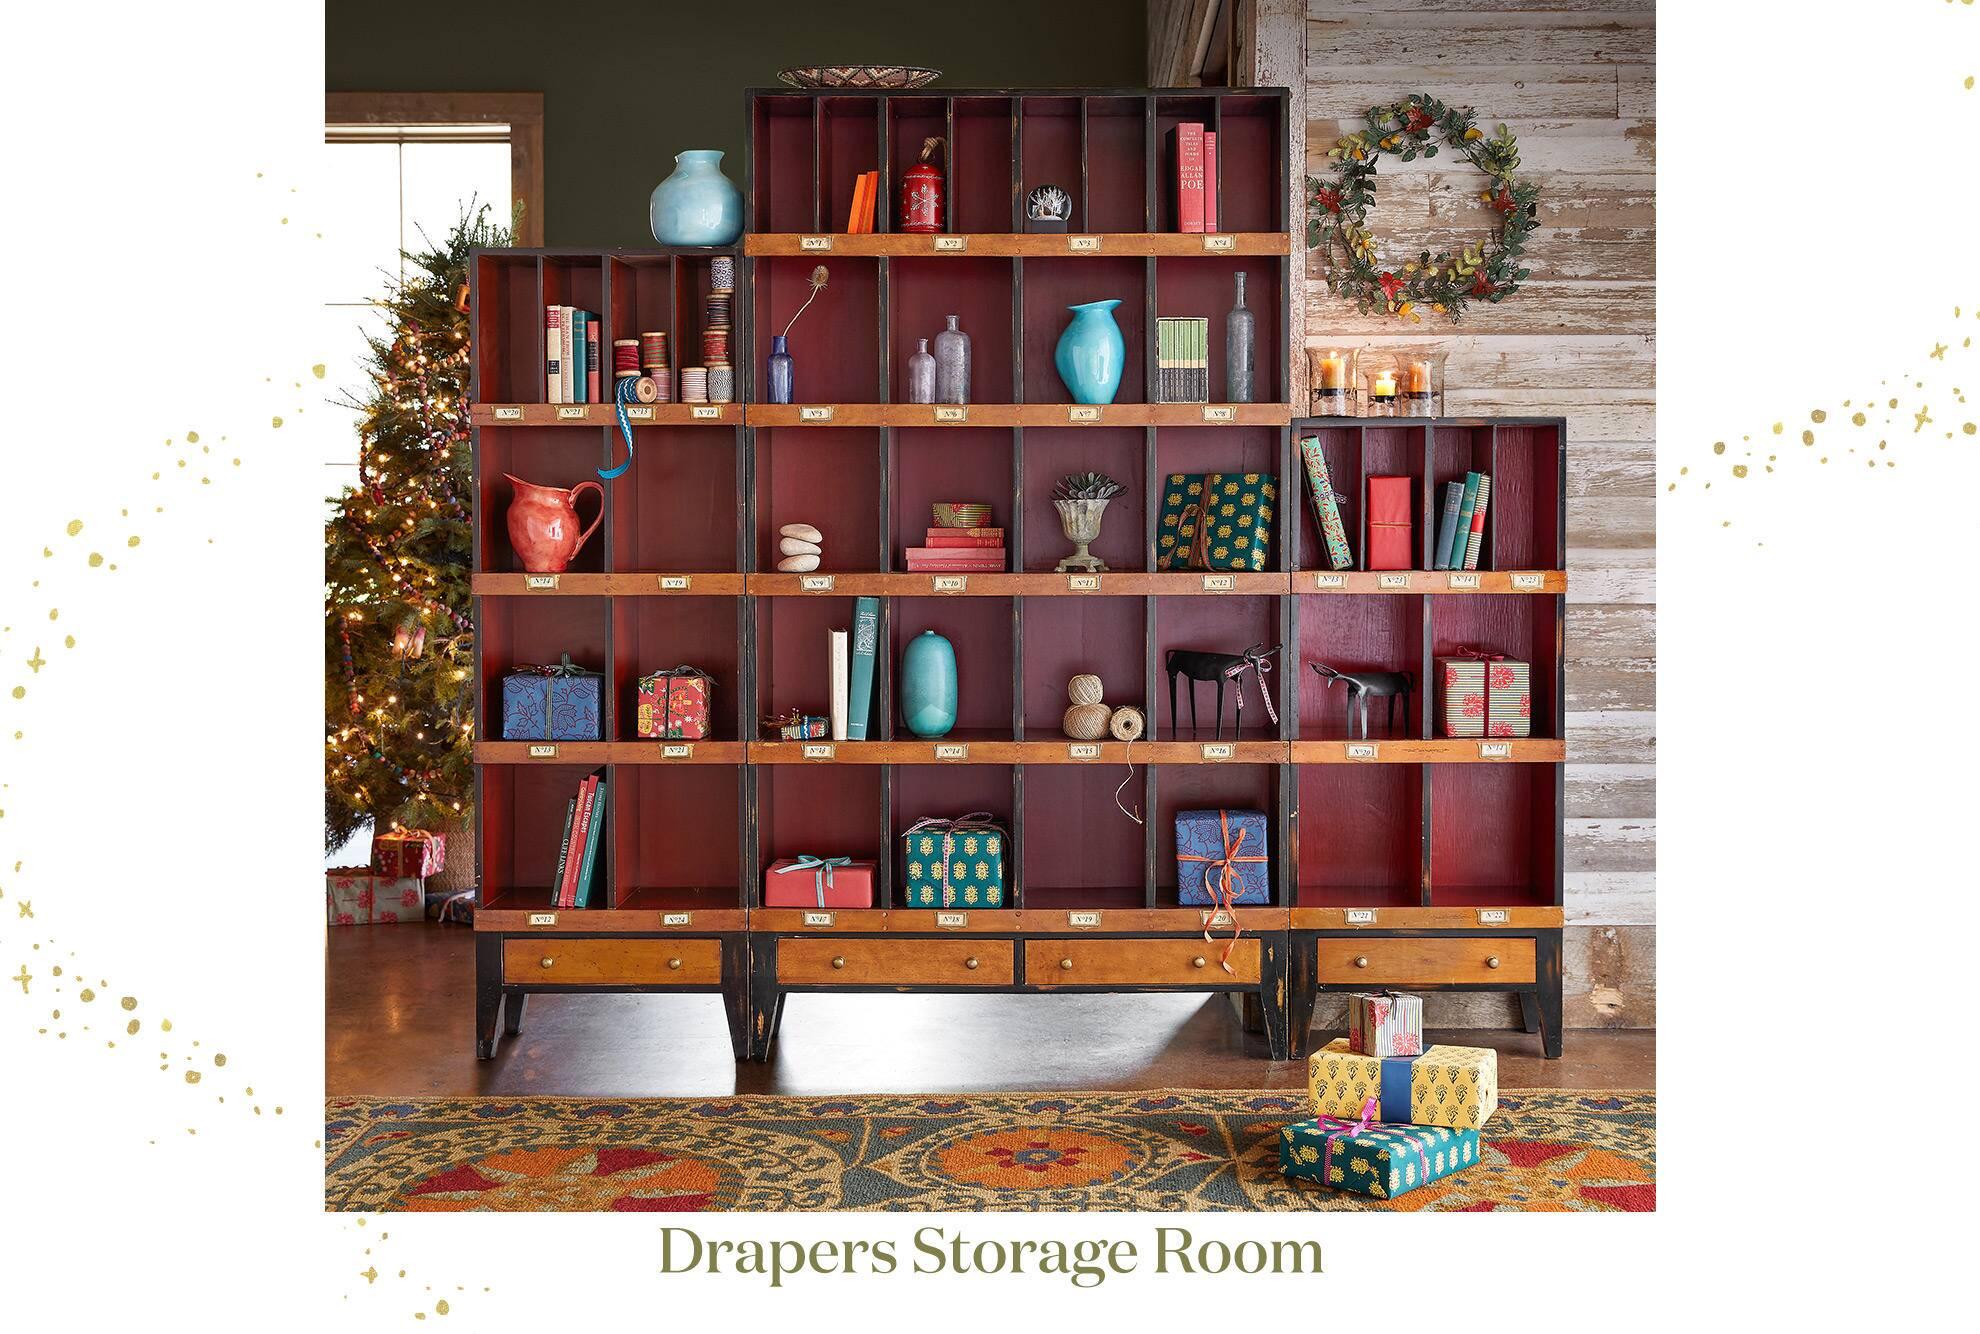 Drapers Storage Room